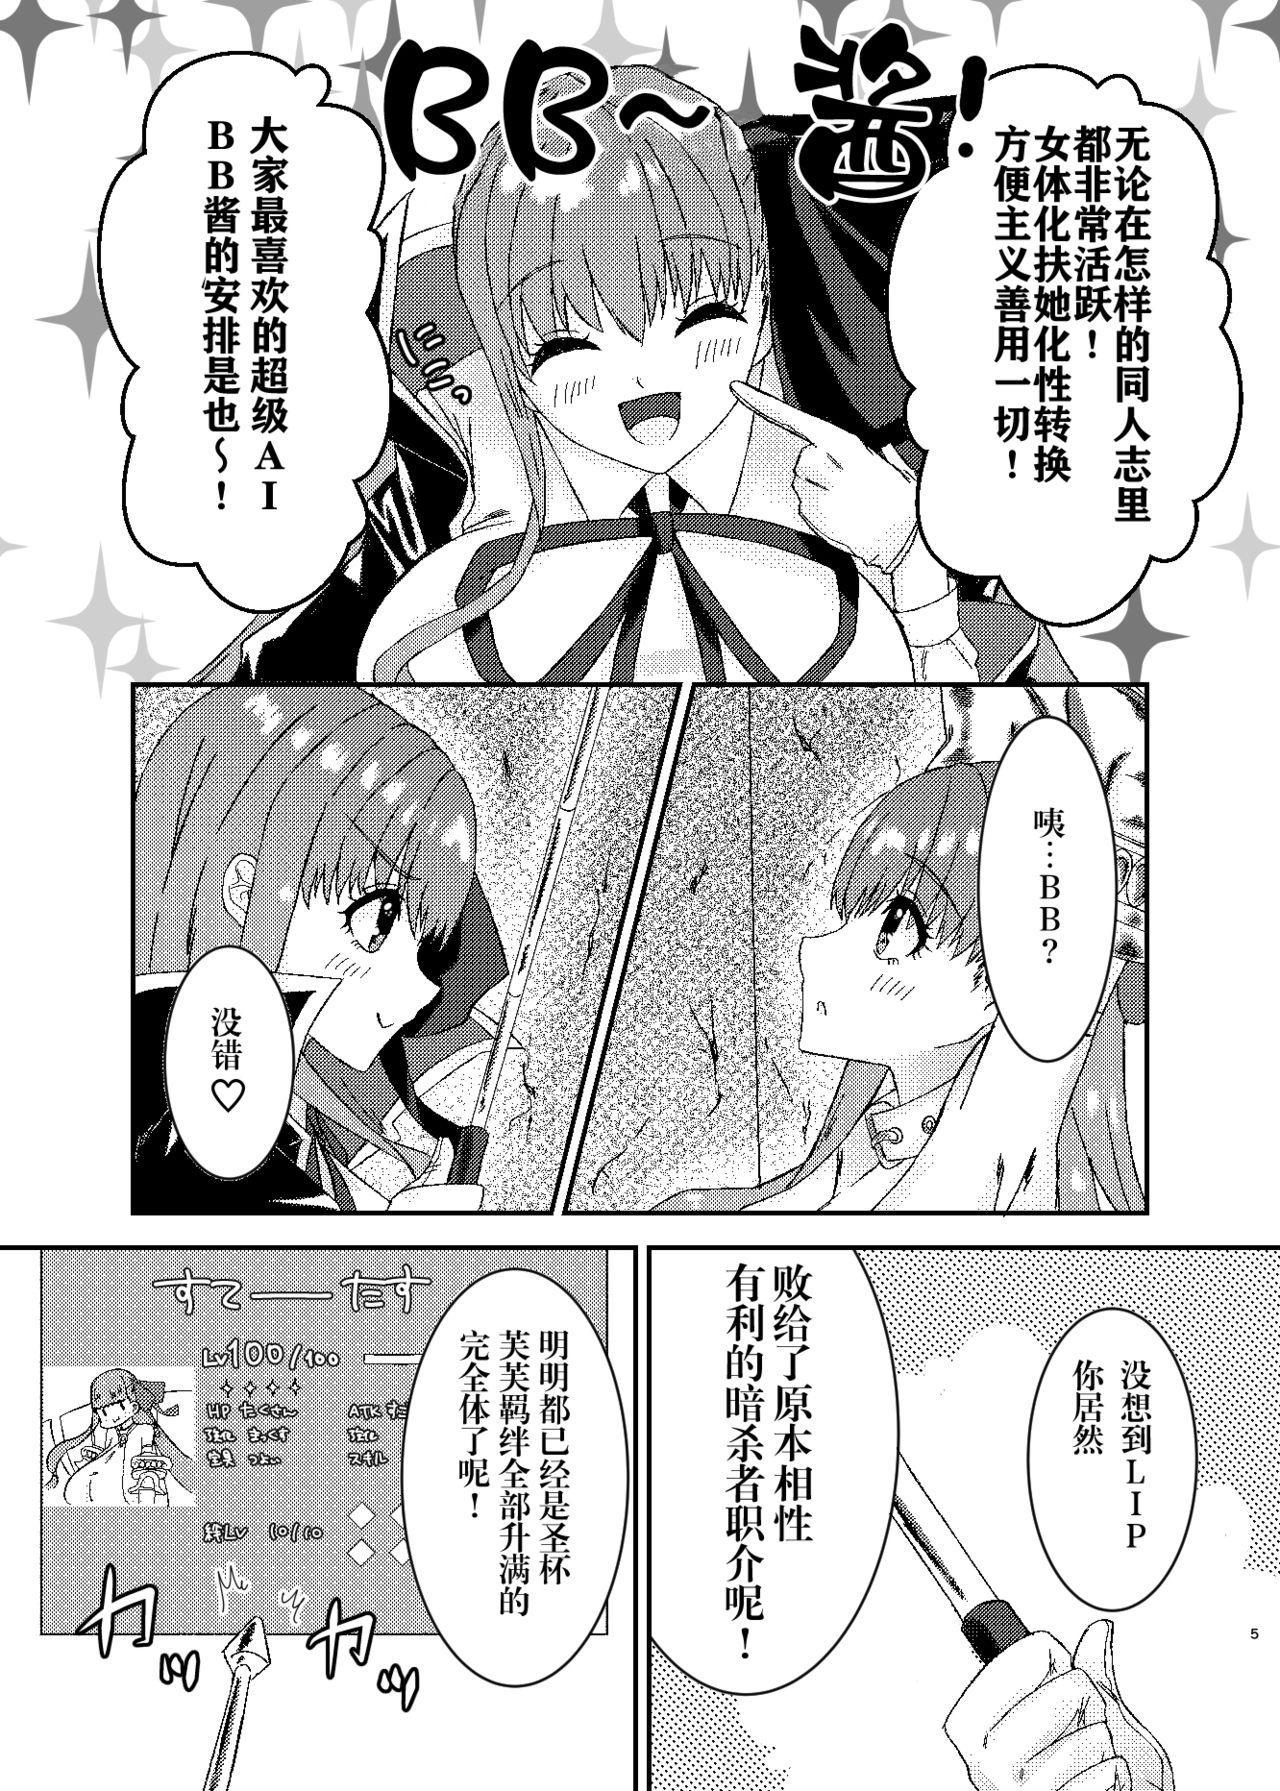 Lip no Oppai ni Oshioki desu | 要对LIP的胸部进行惩罚了 3